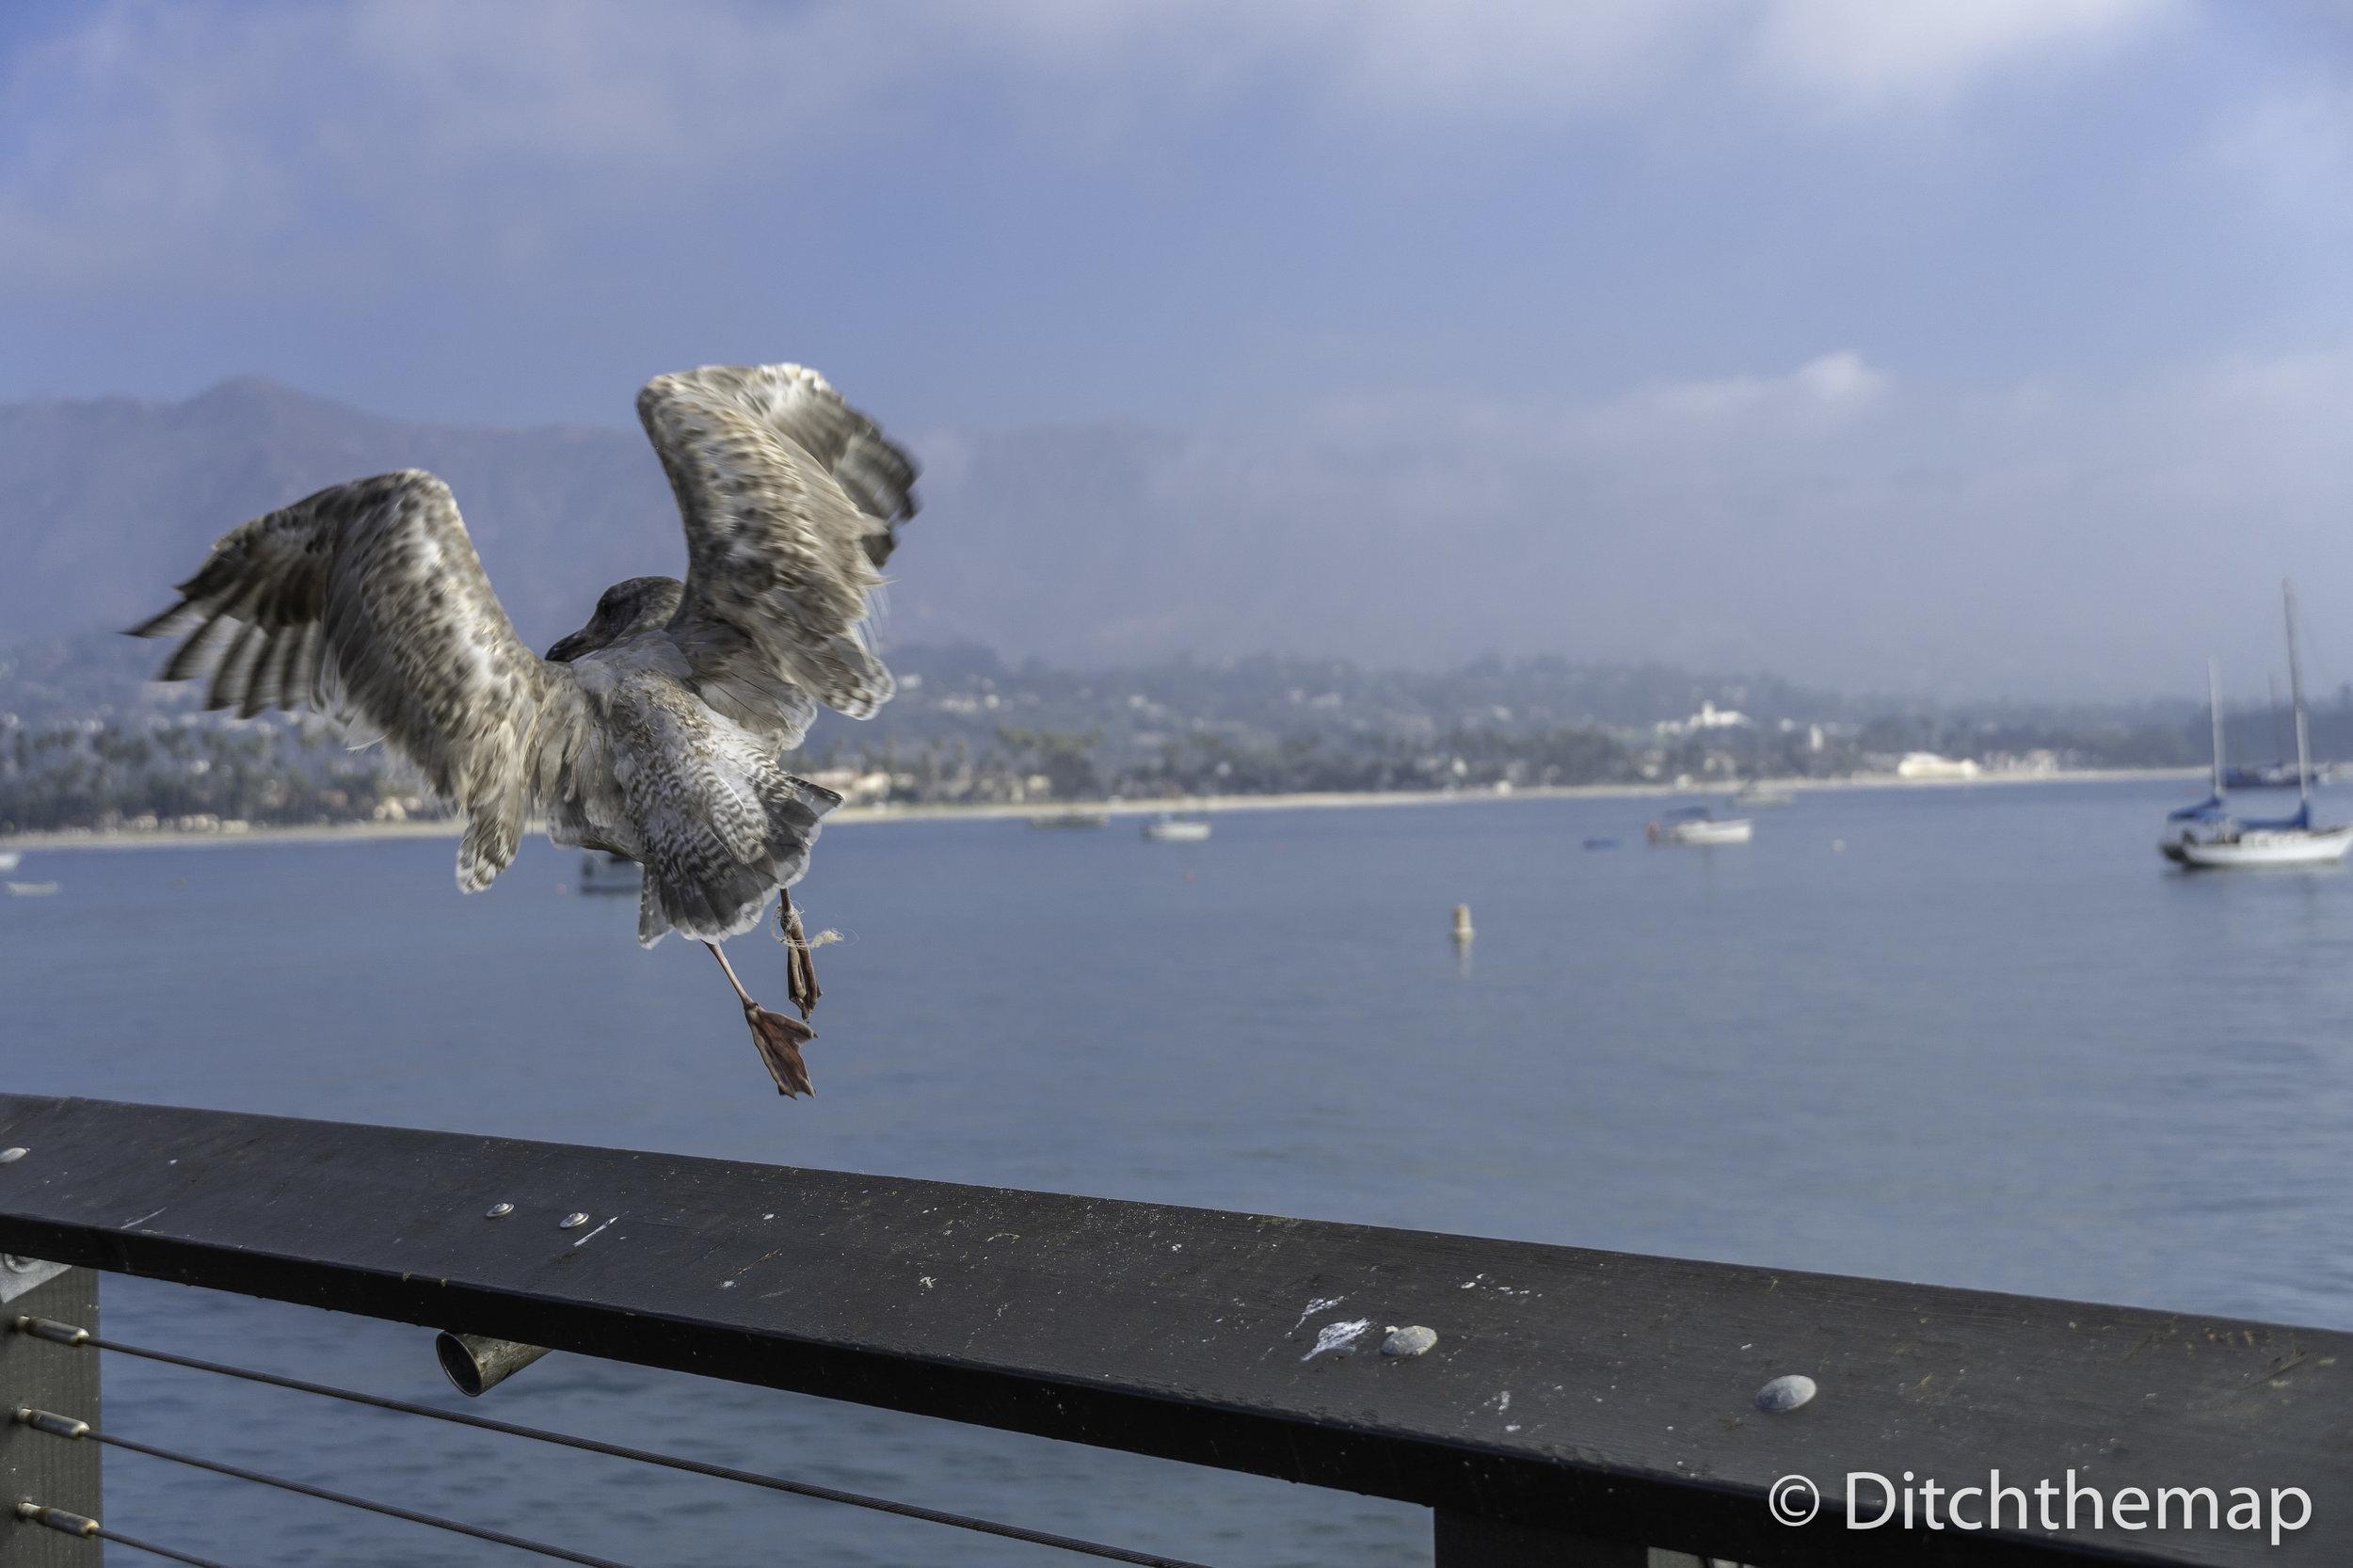 Downtown Santa Barbara - Central California Coastal City